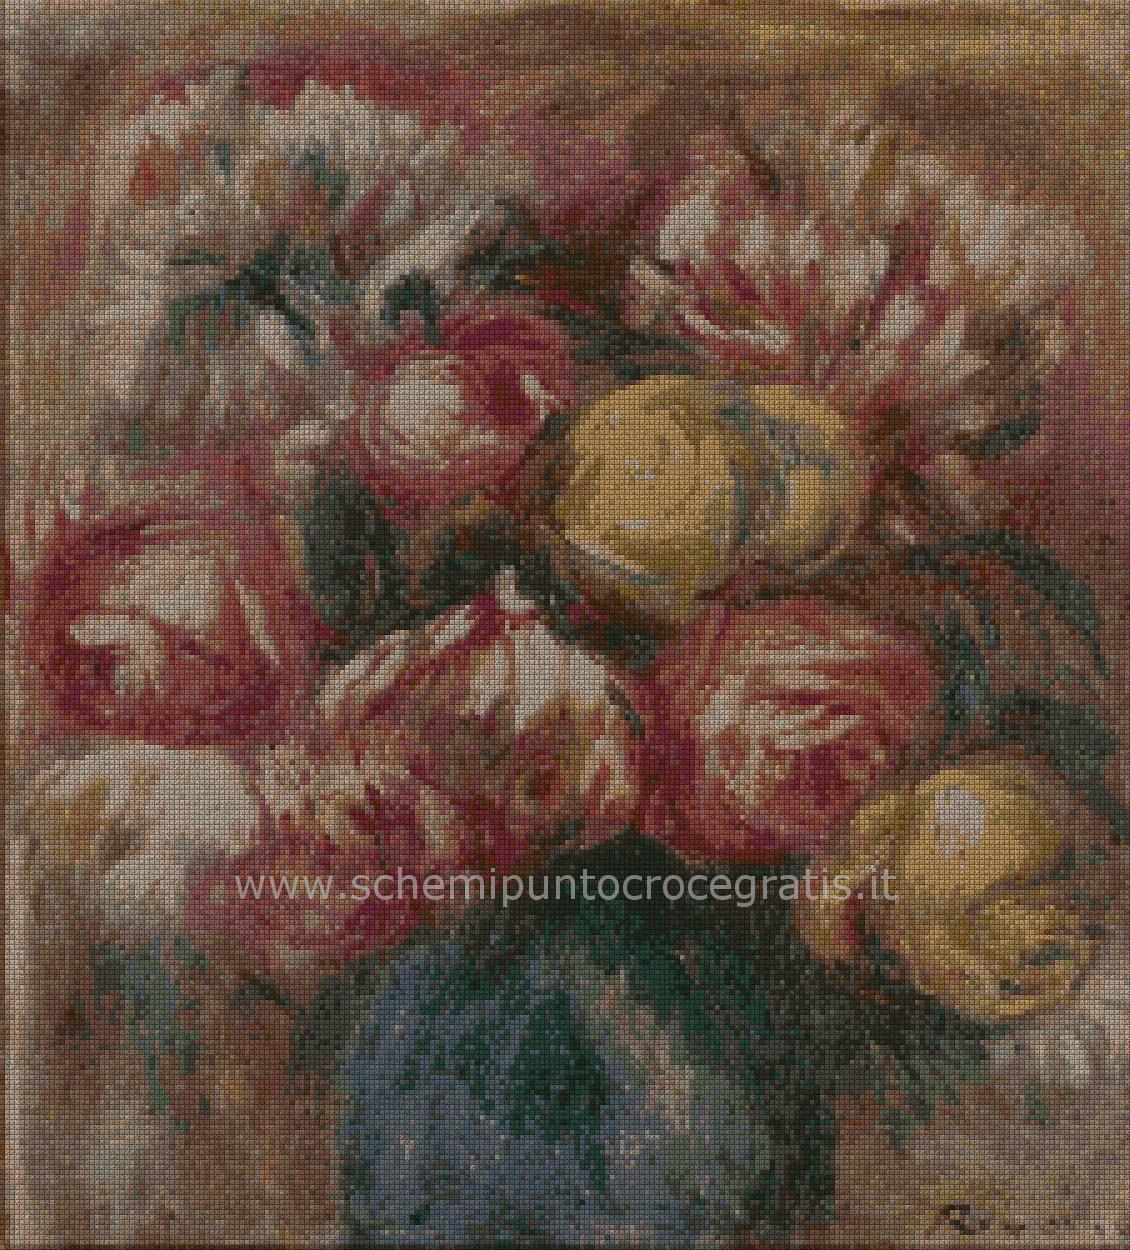 pittori_moderni/renoir/Renoir03.jpg